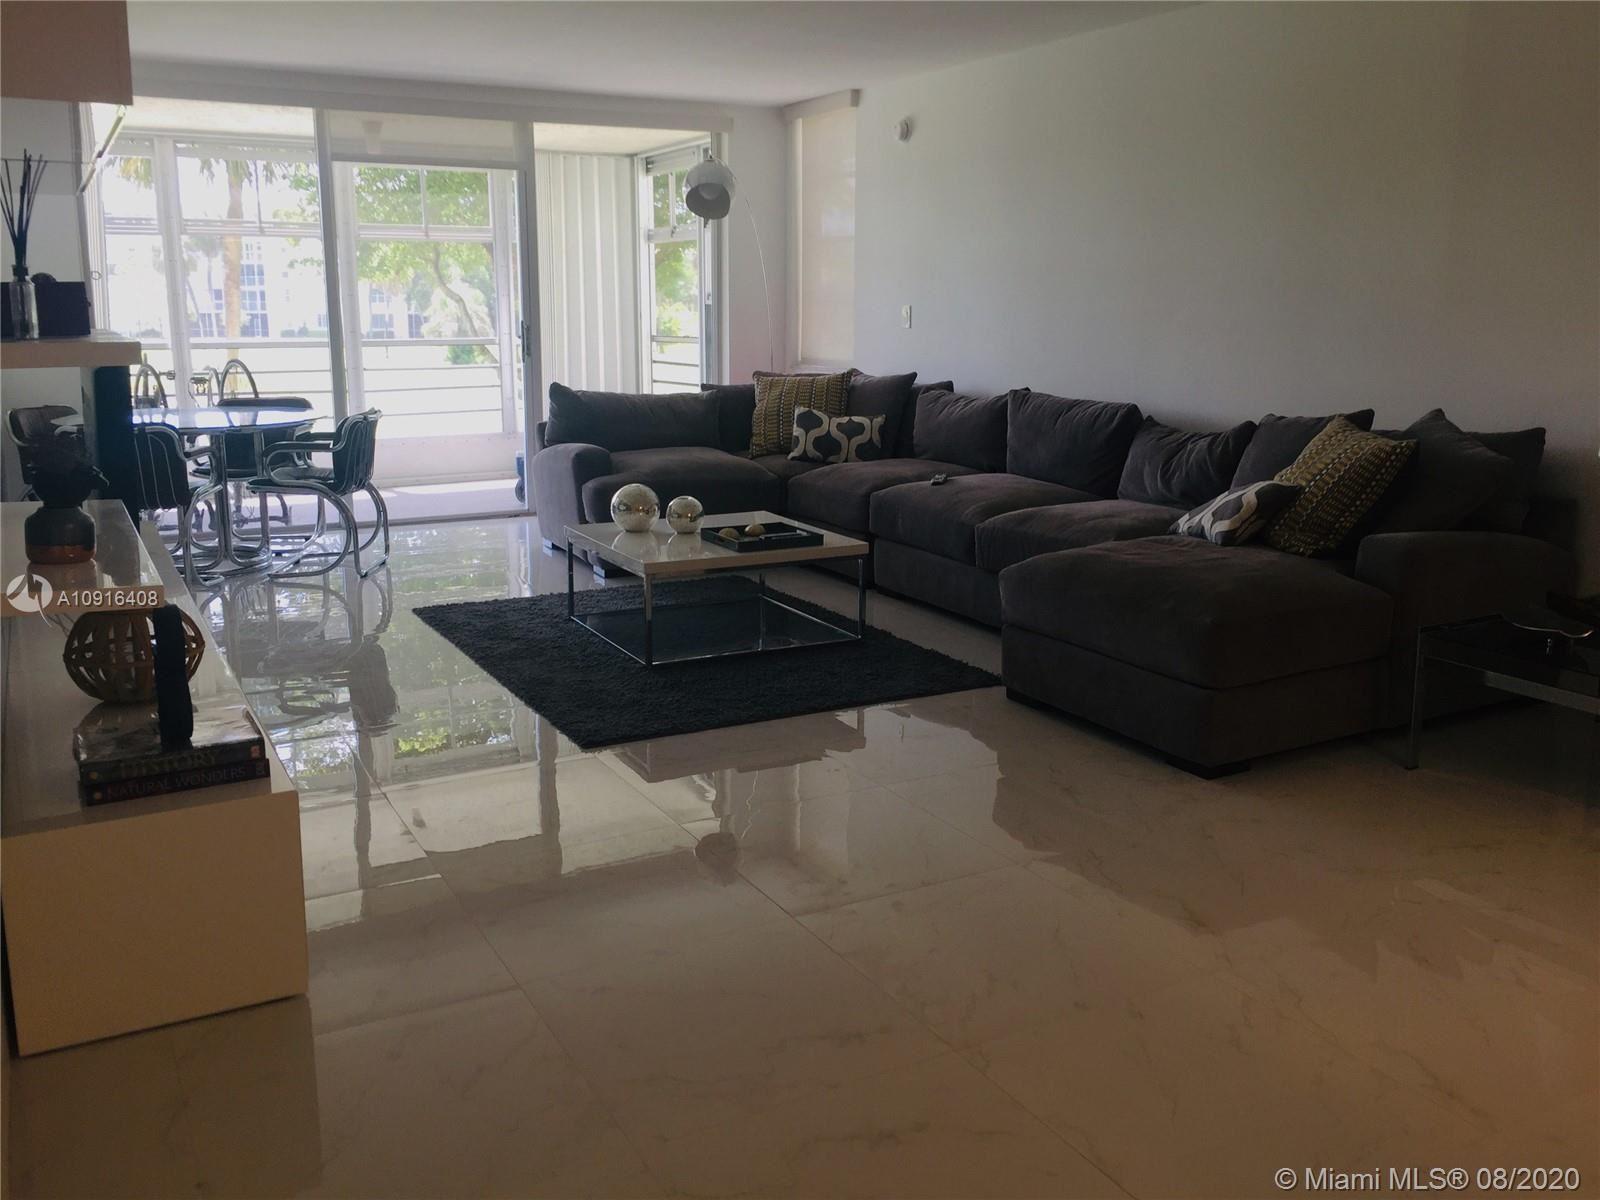 805 Cypress Blvd #210, Pompano Beach, FL 33069 - #: A10916408